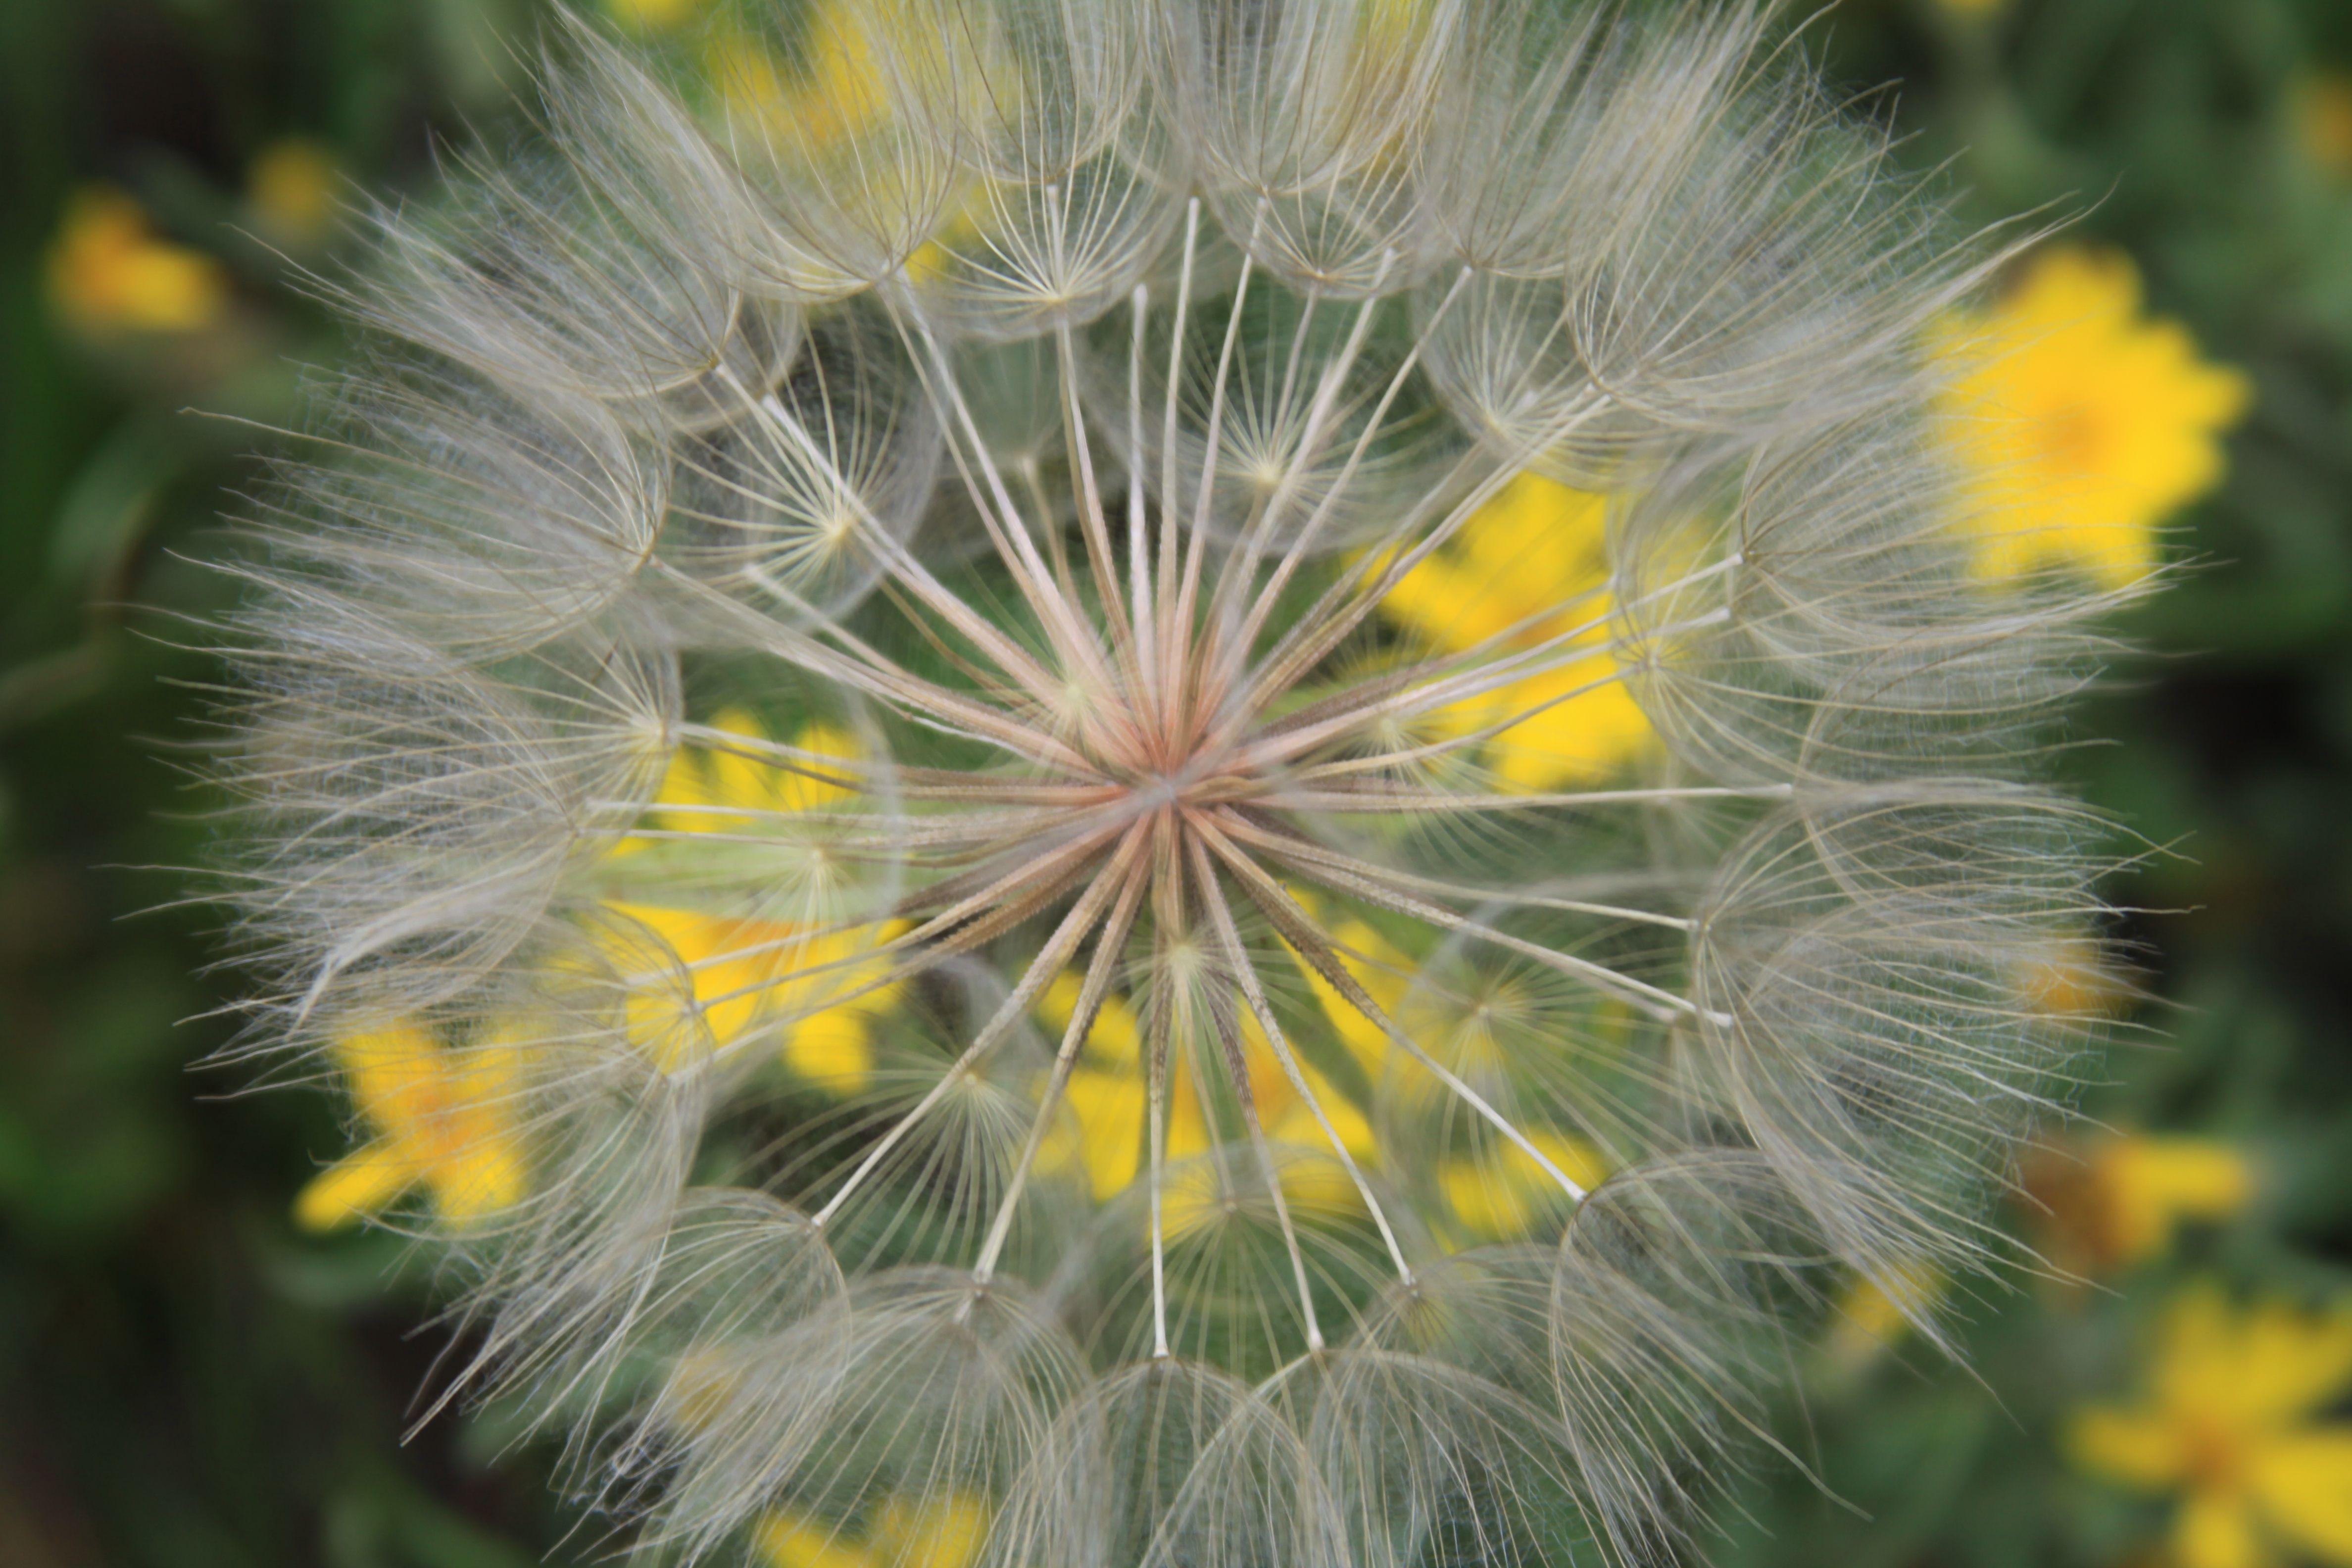 Dandelion in Crested Butte, CO